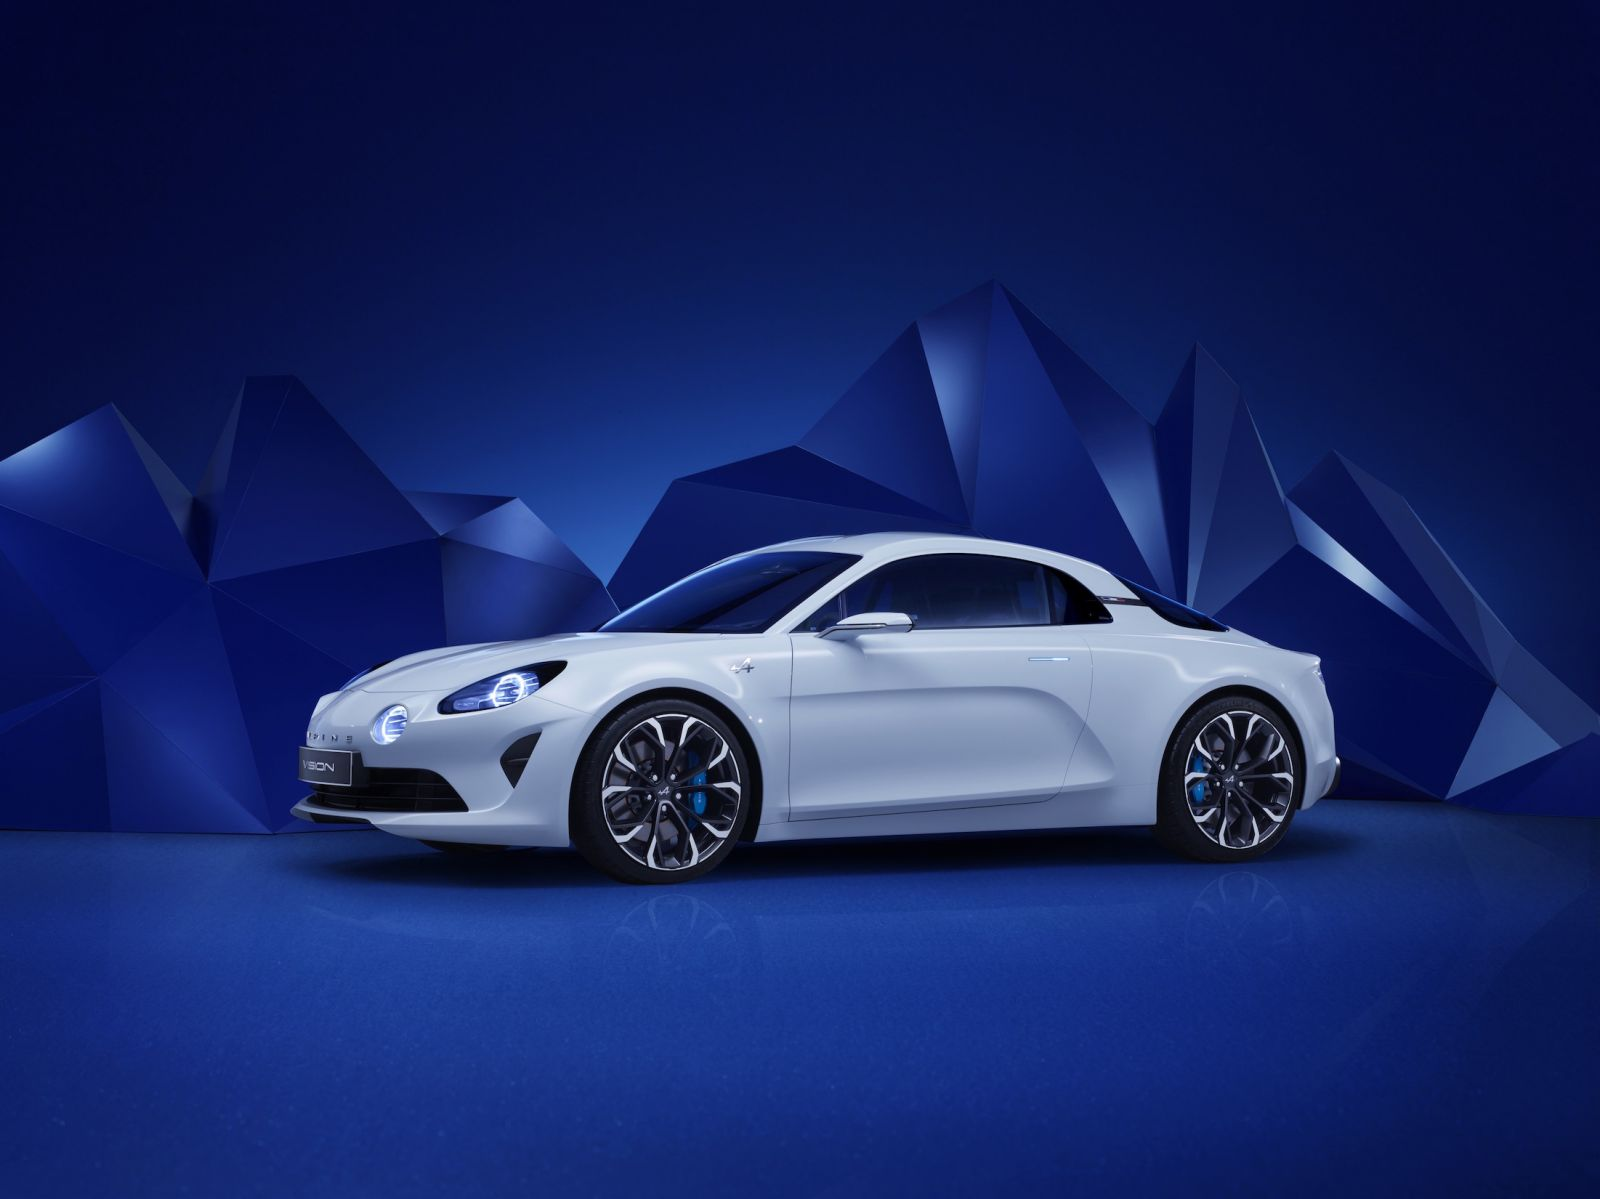 Alpine Vision Concept Revealed In Monte Carlo - Video